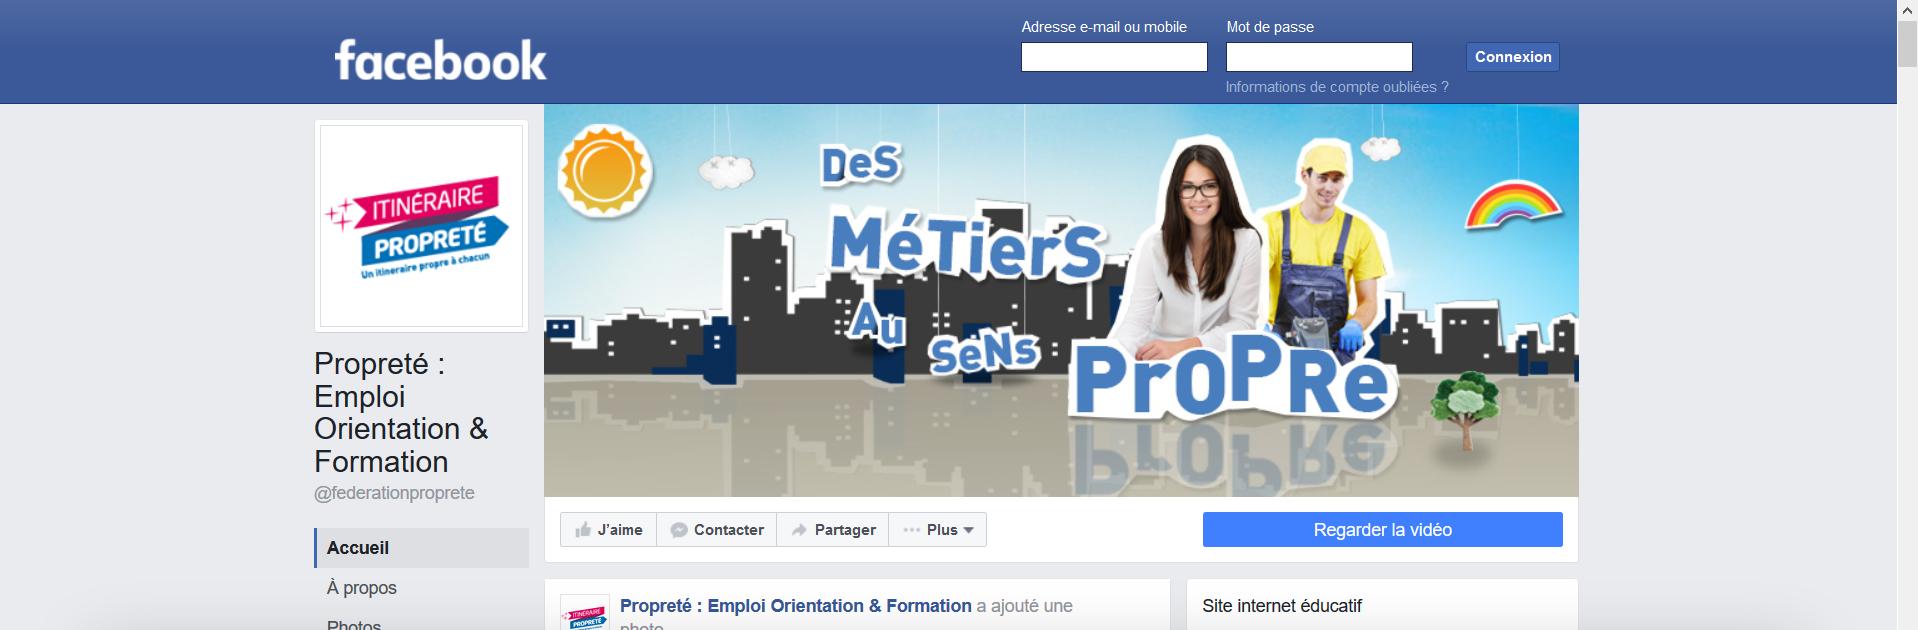 facebook Monde de la propreté - La Manane, l'agence de com pédagogique crossmedia